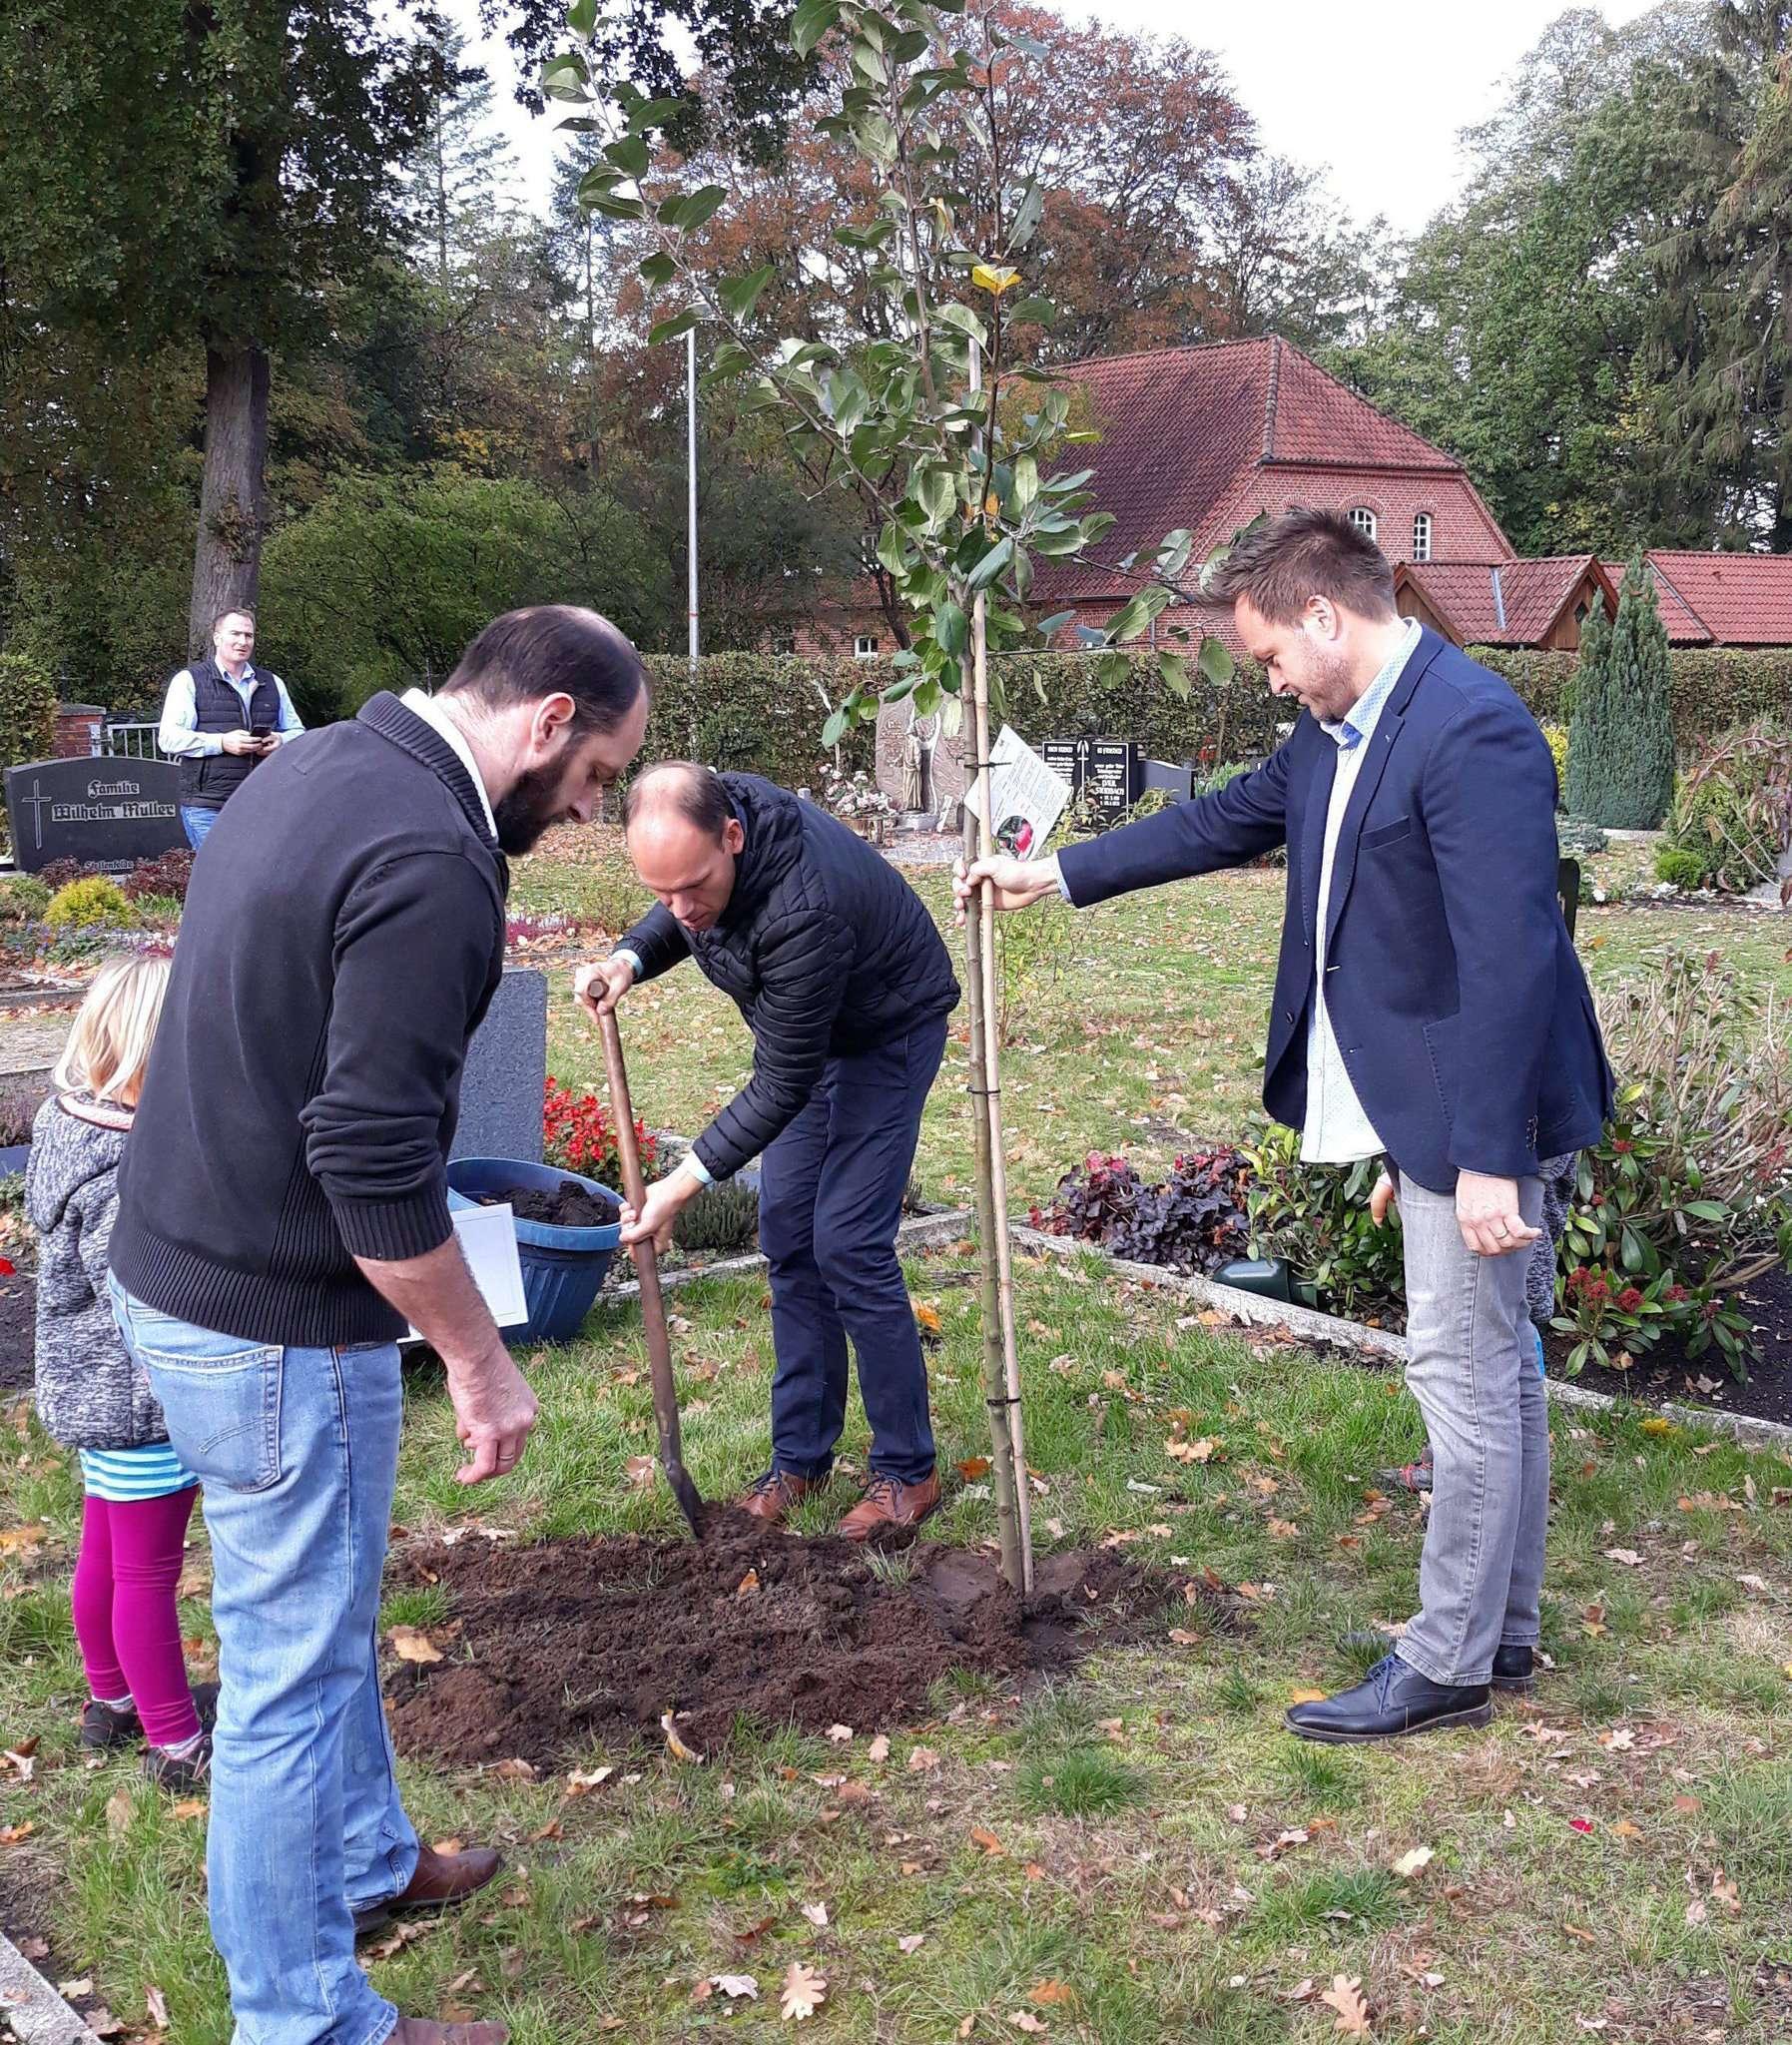 Teilnehmer an der Silber-Konfirmation pflanzten einen Apfelbaum hinter der Kirche.